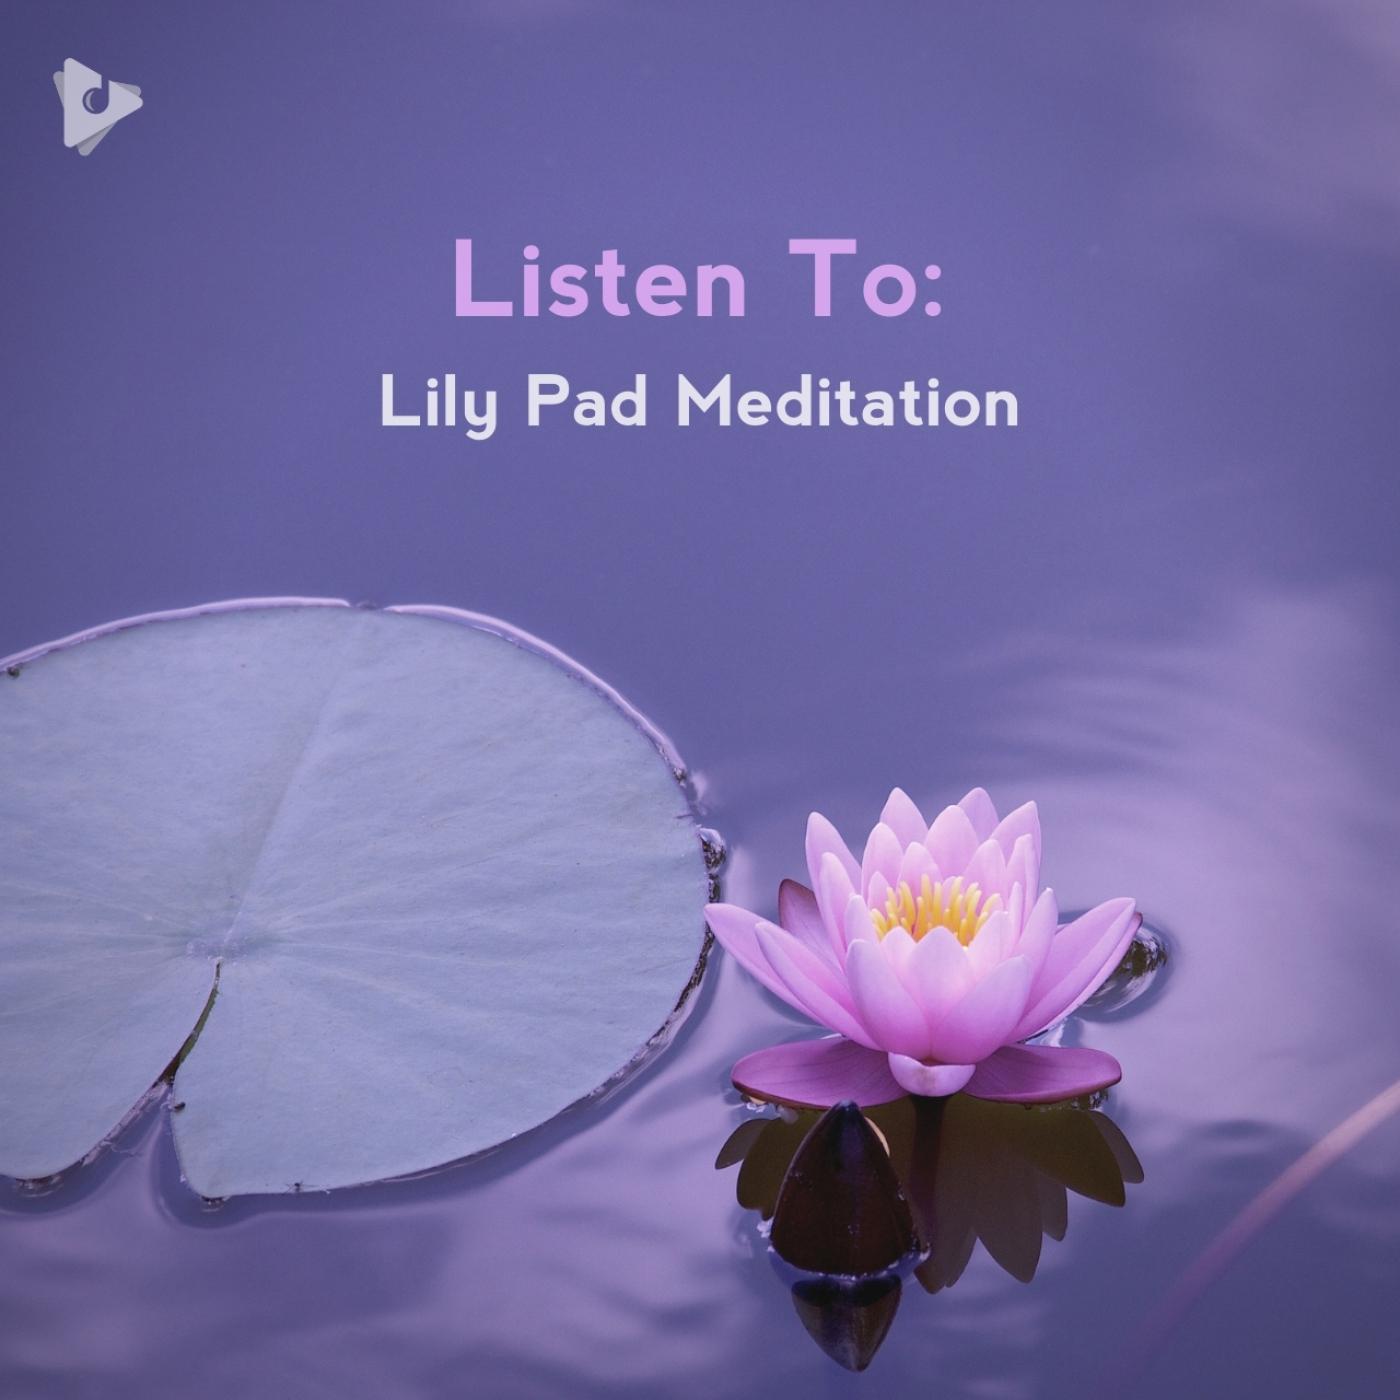 Listen To: Lily Pad Meditation